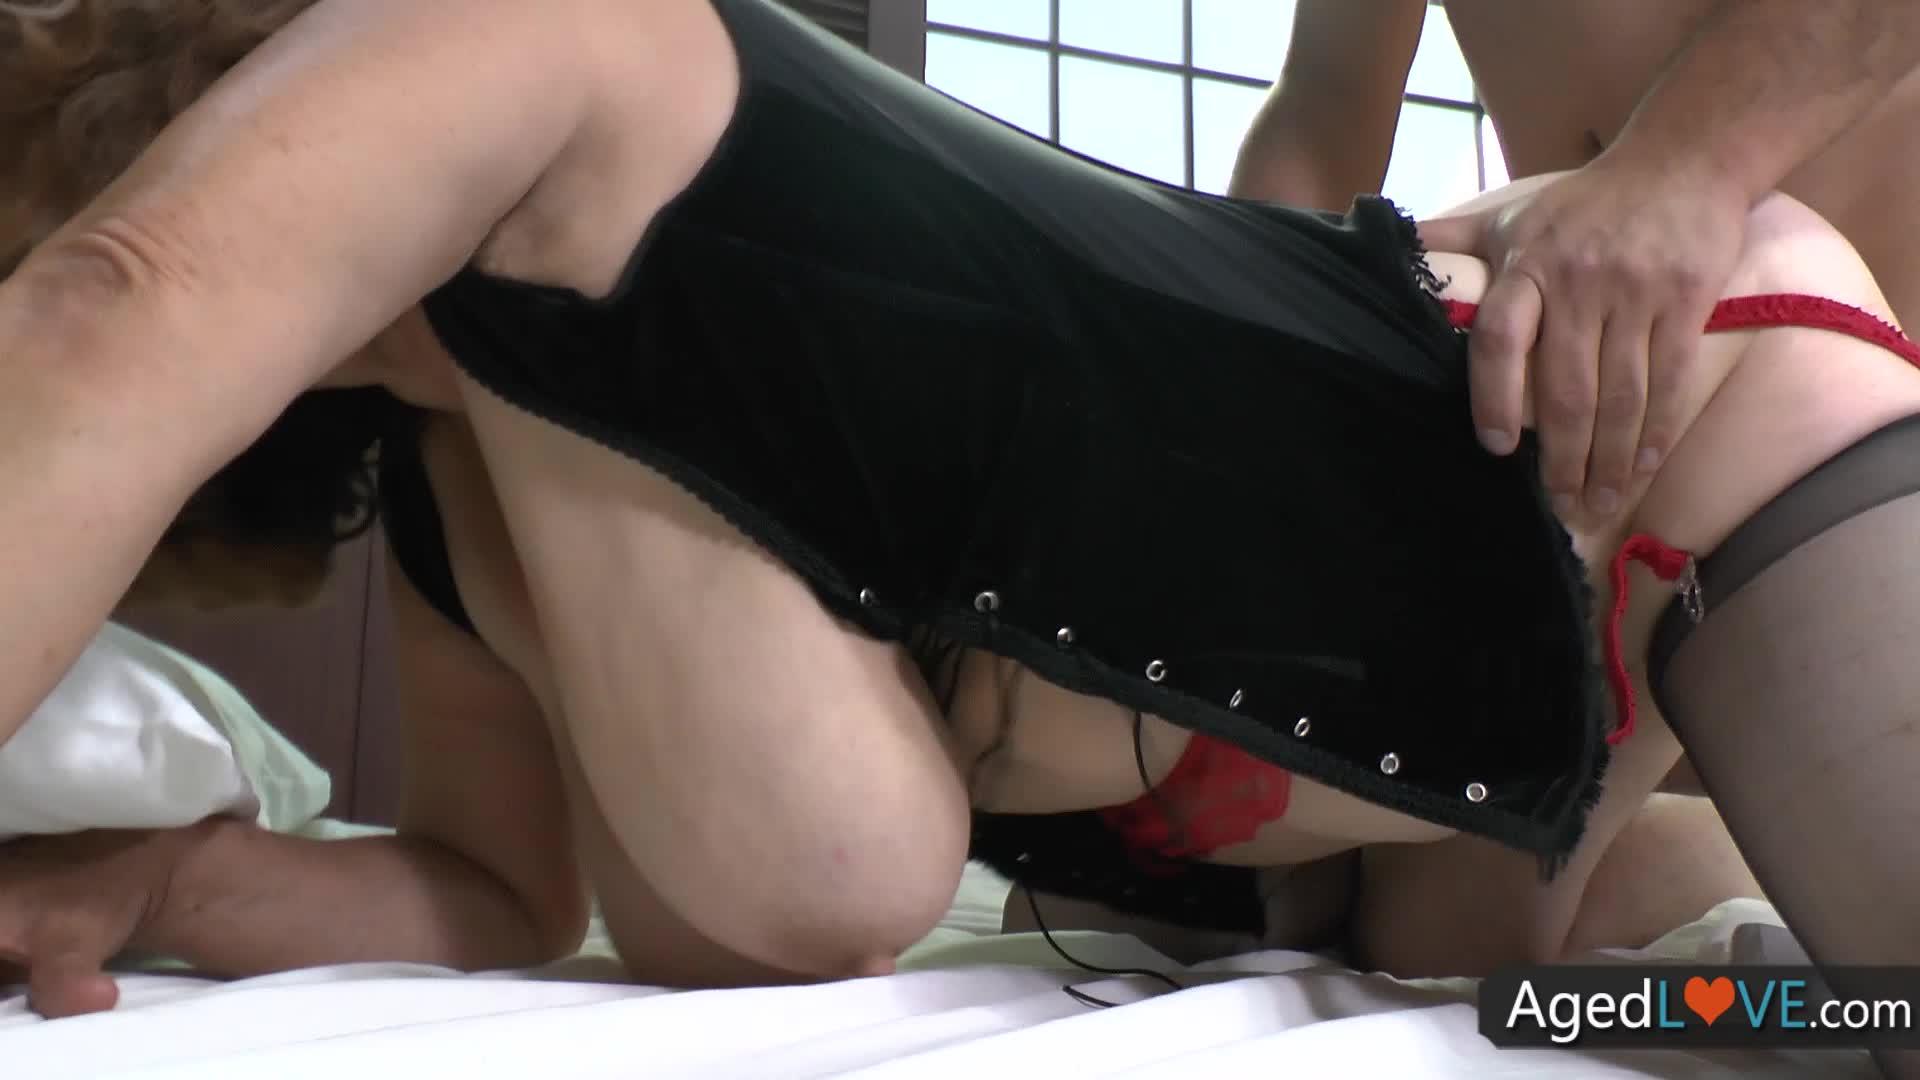 Agedlove sami brenda mature hardcore porn video tube